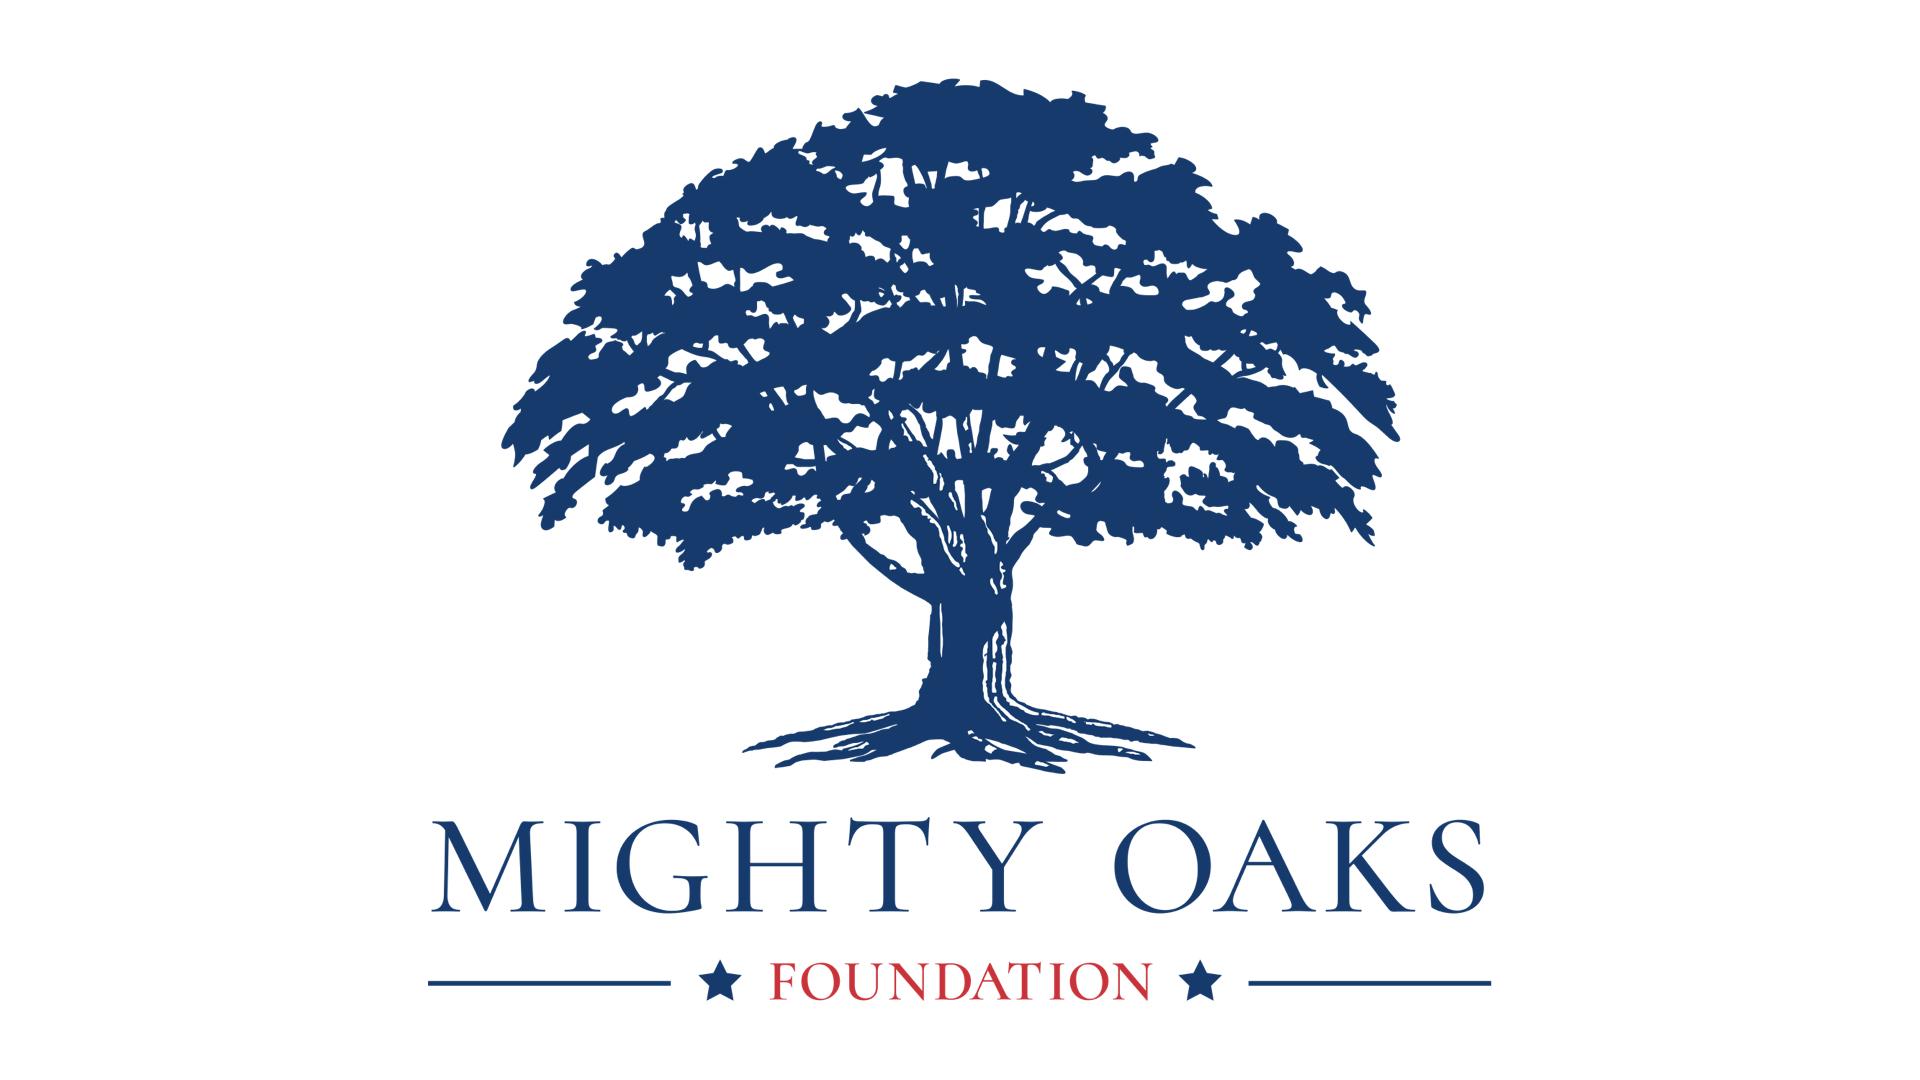 Mighty Oaks Foundation